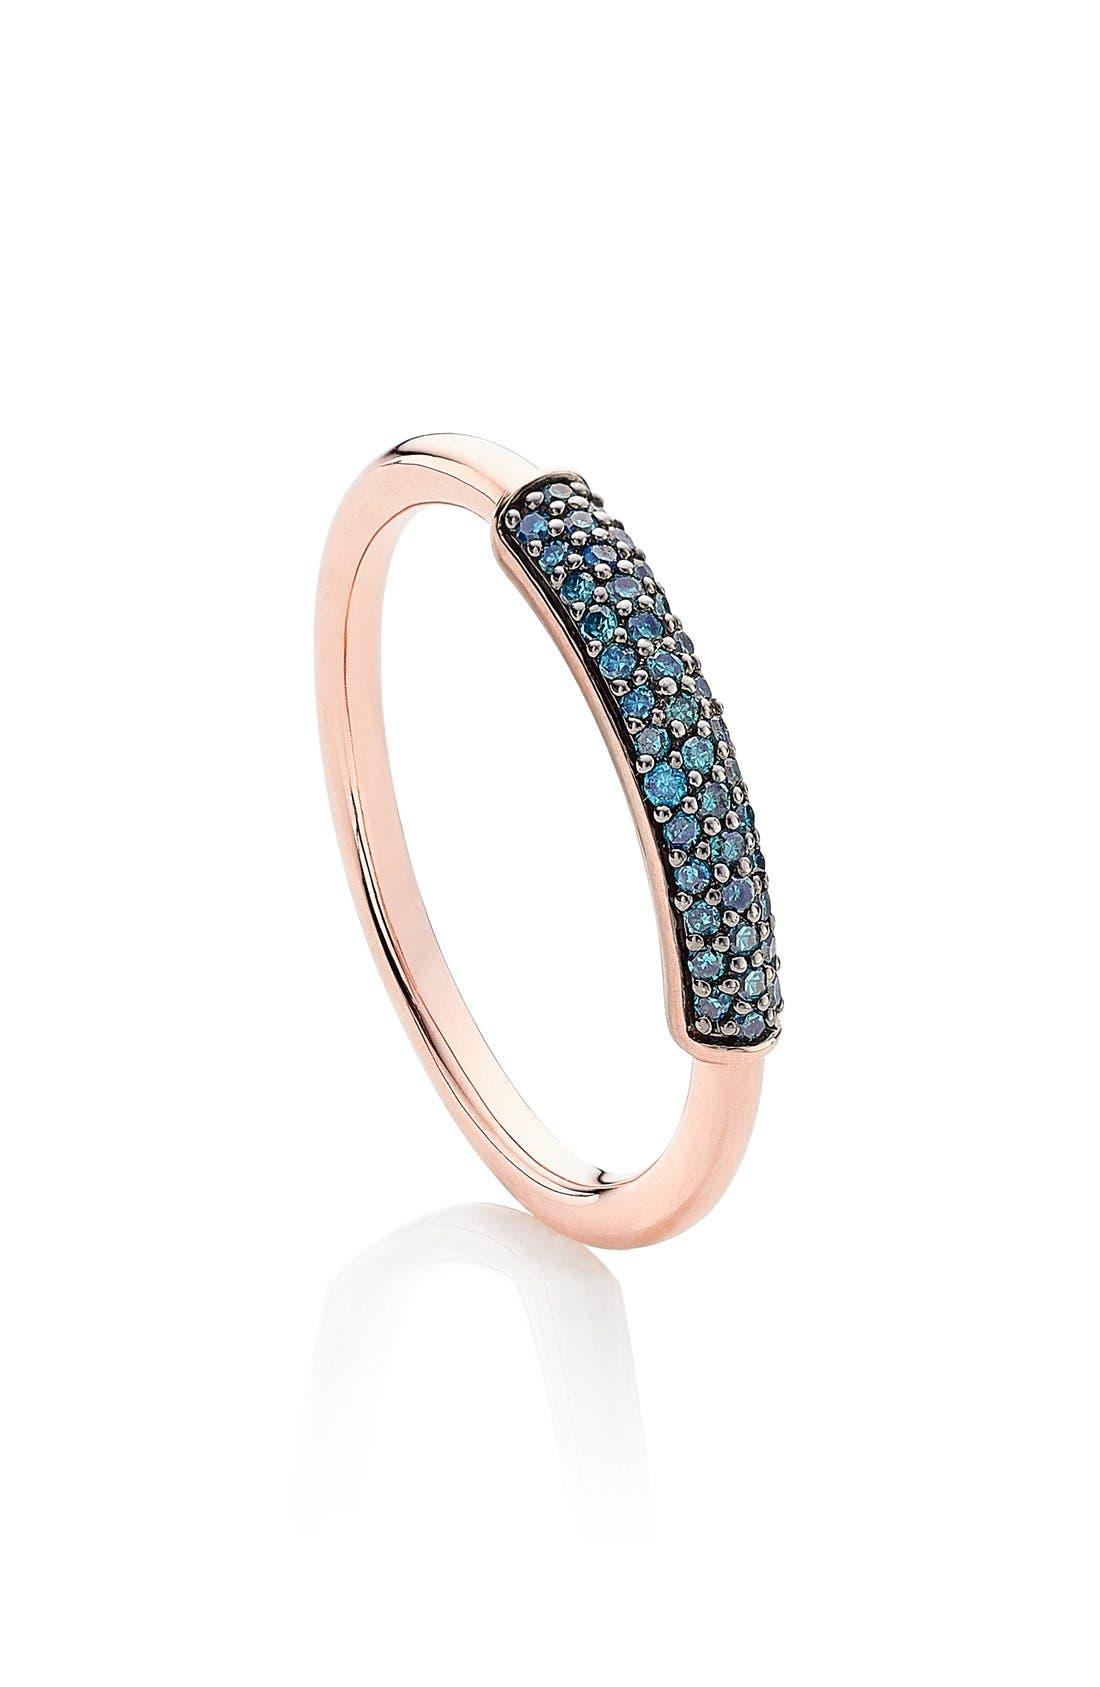 'Stellar' Diamond Band Ring,                         Main,                         color, BLUE DIAMOND/ ROSE GOLD